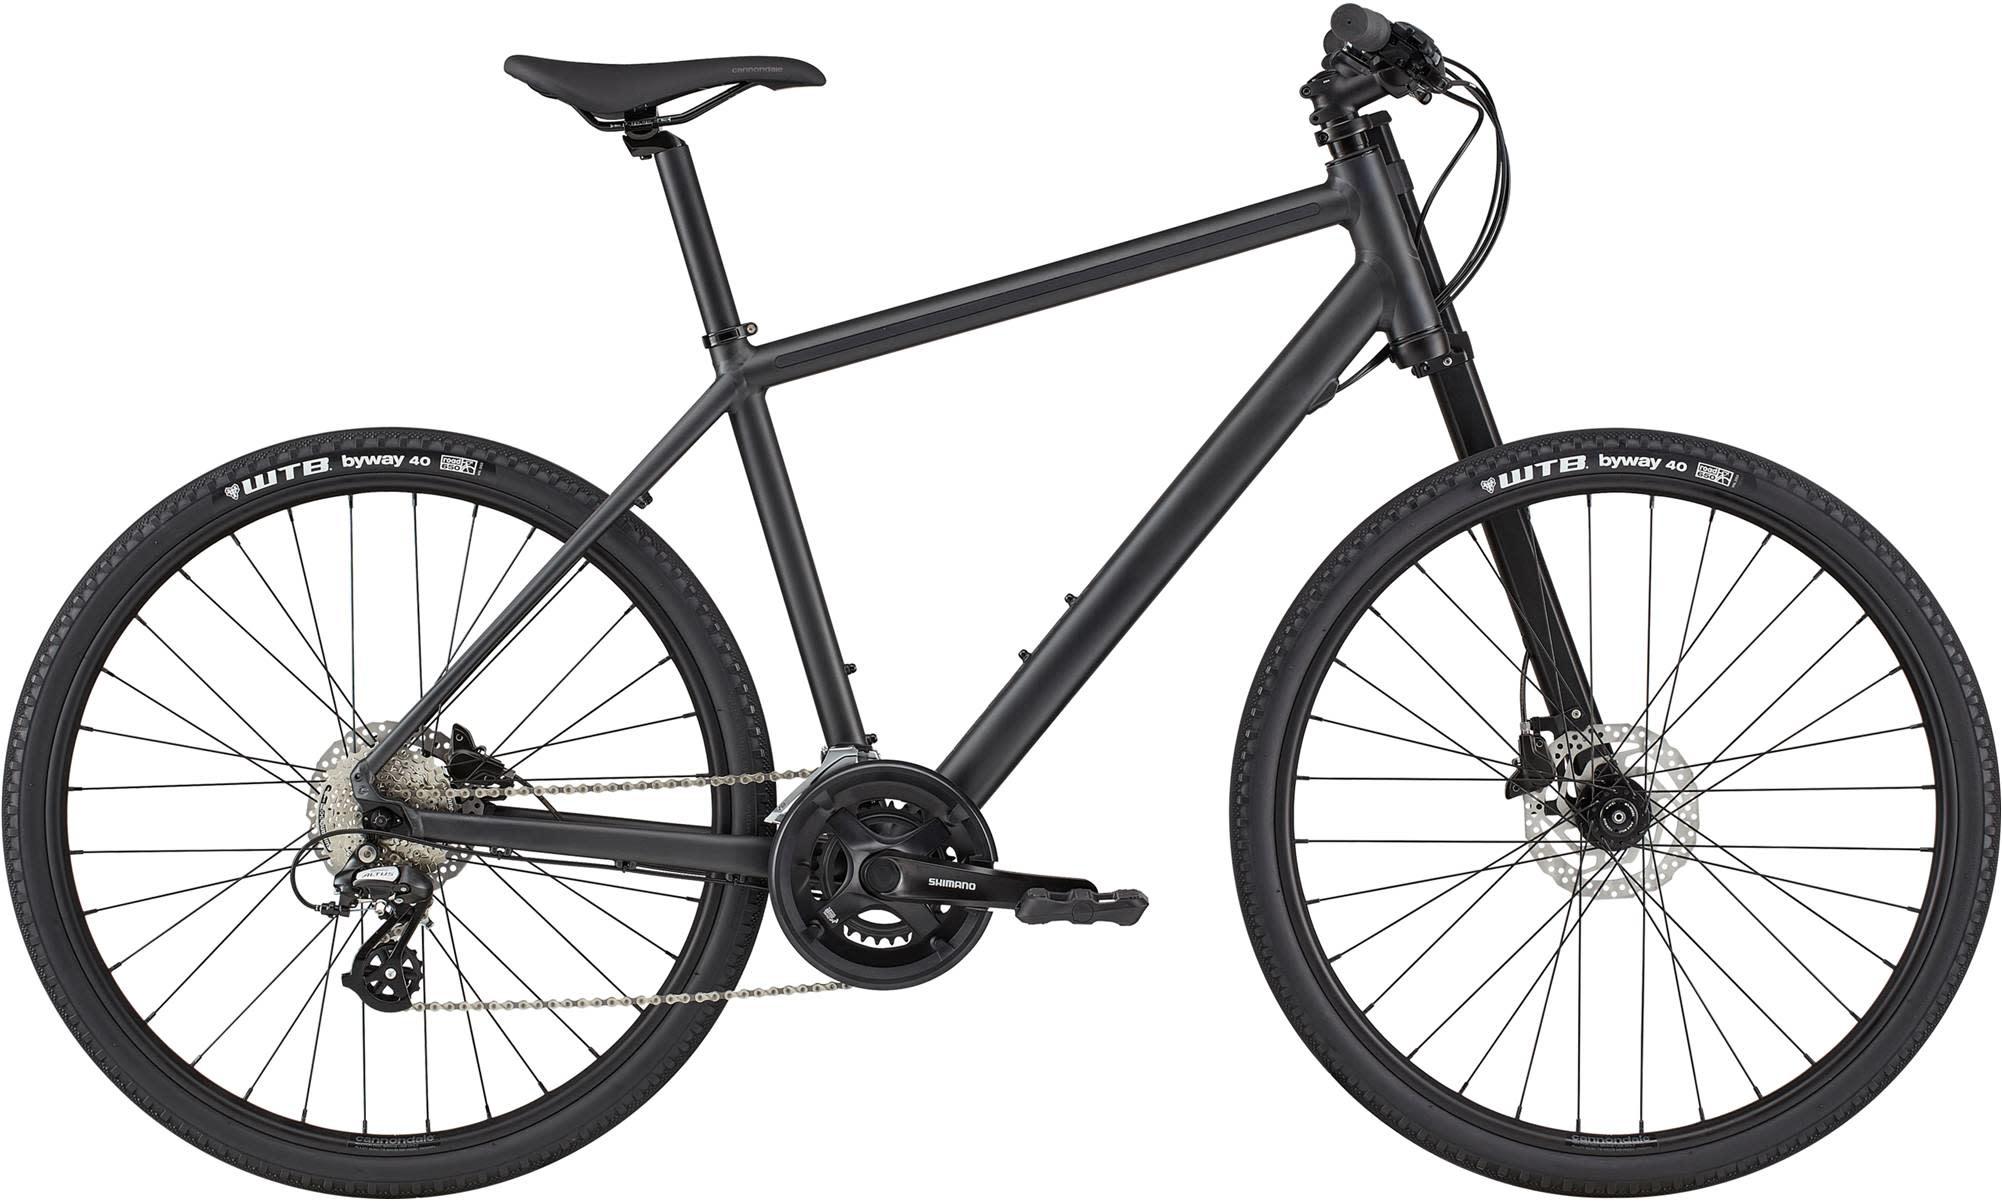 Cannondale Cannondale Bad Boy 3 City Bike 2020